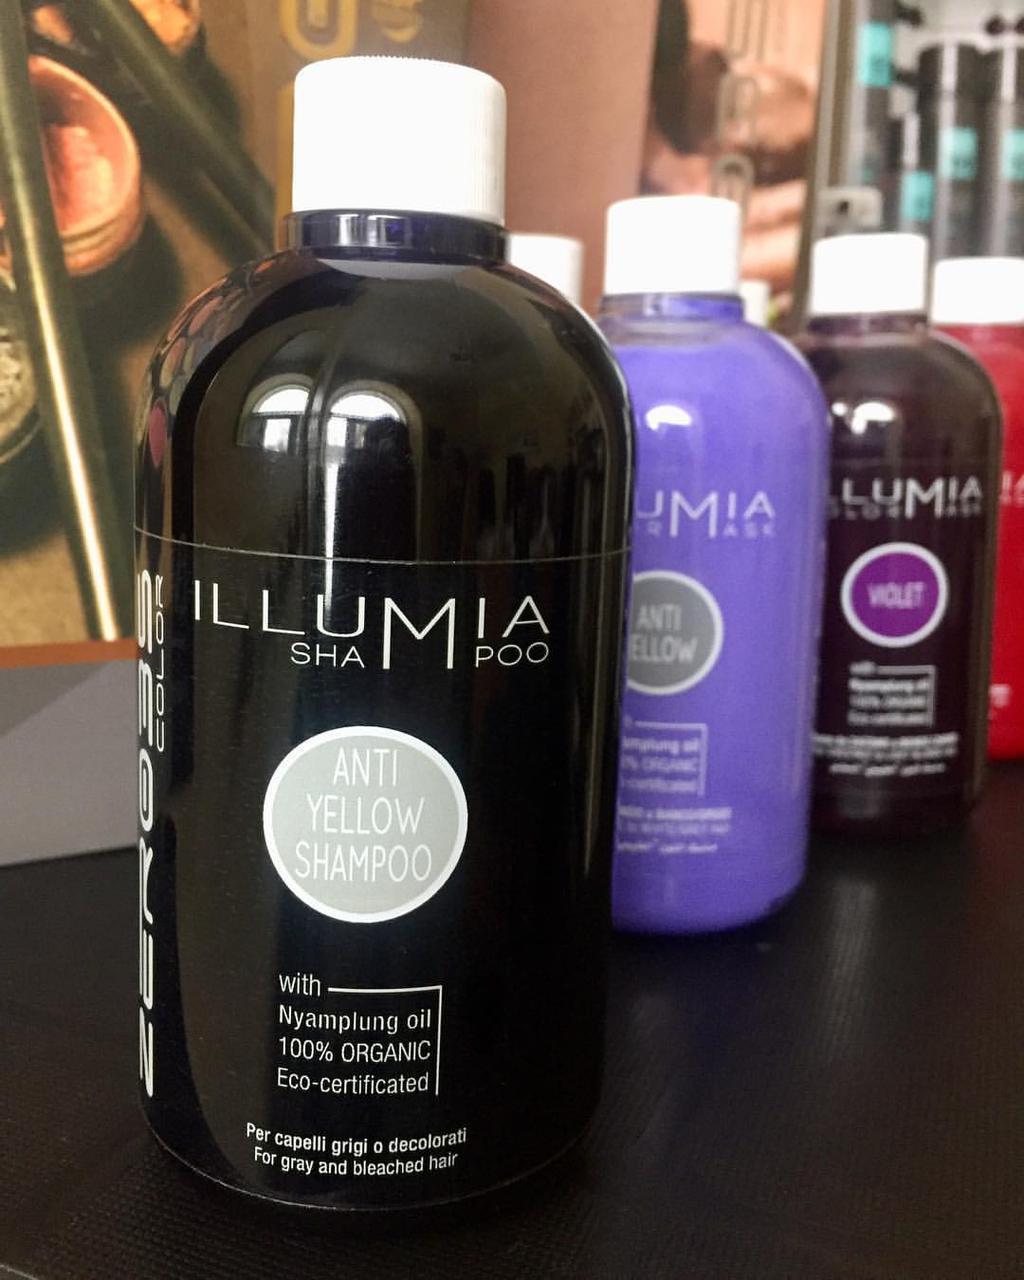 Emmebi Illumia Shampoo Anty Yellow  Шампунь-антижелтизна